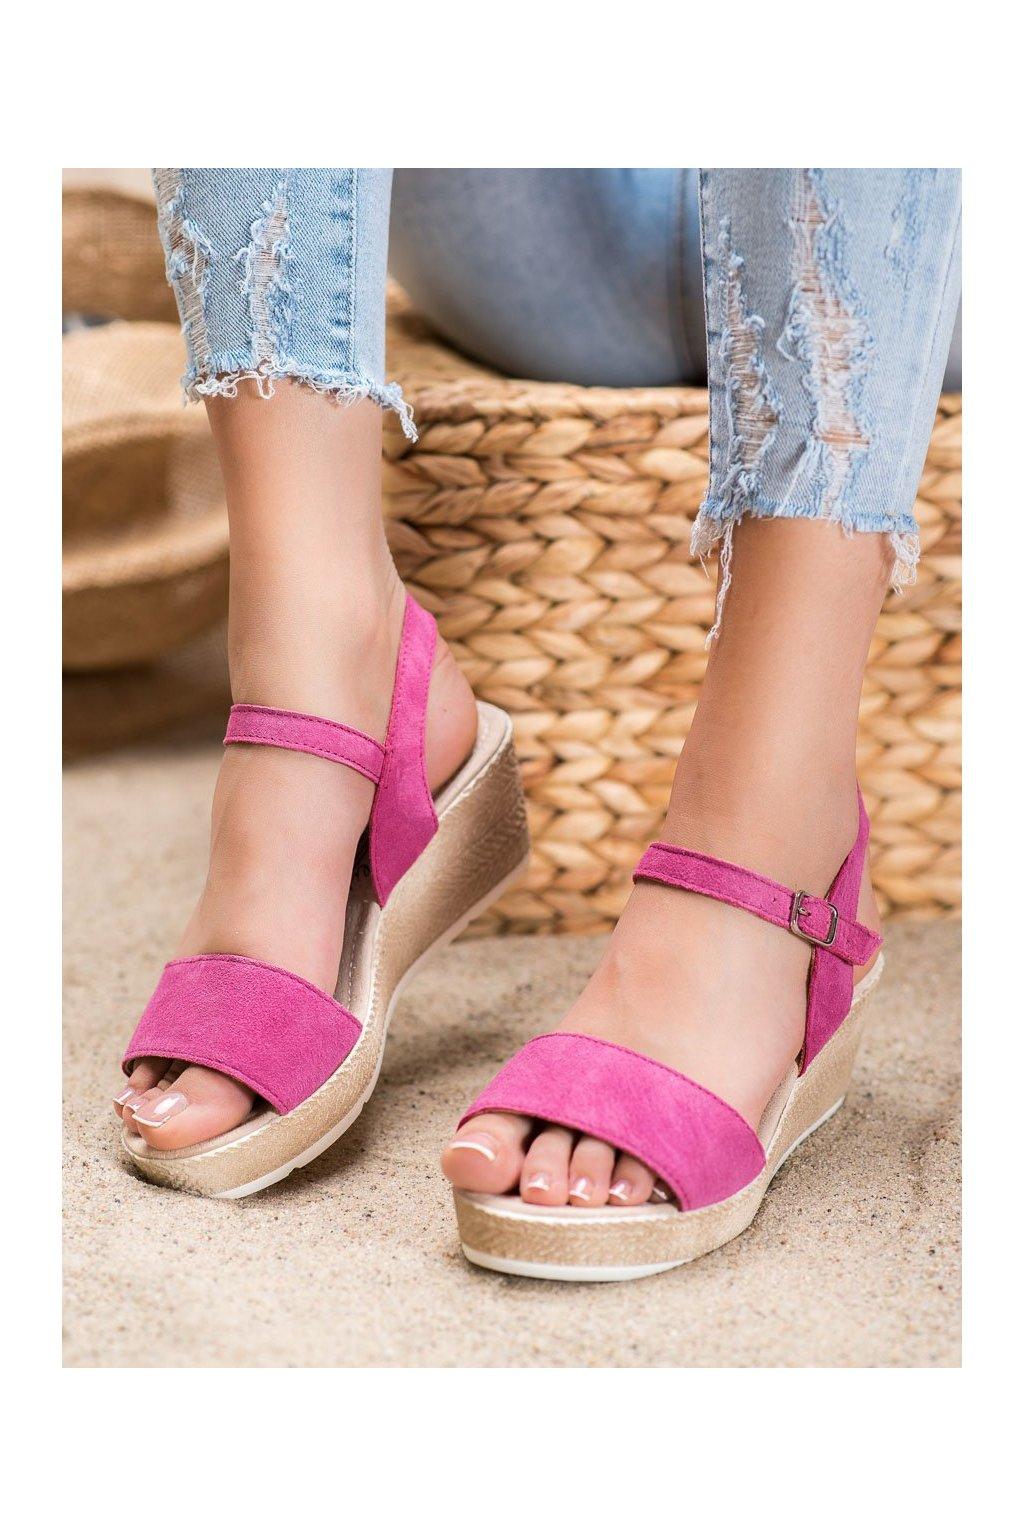 Ružové sandále Filippo kod DS1330/20F